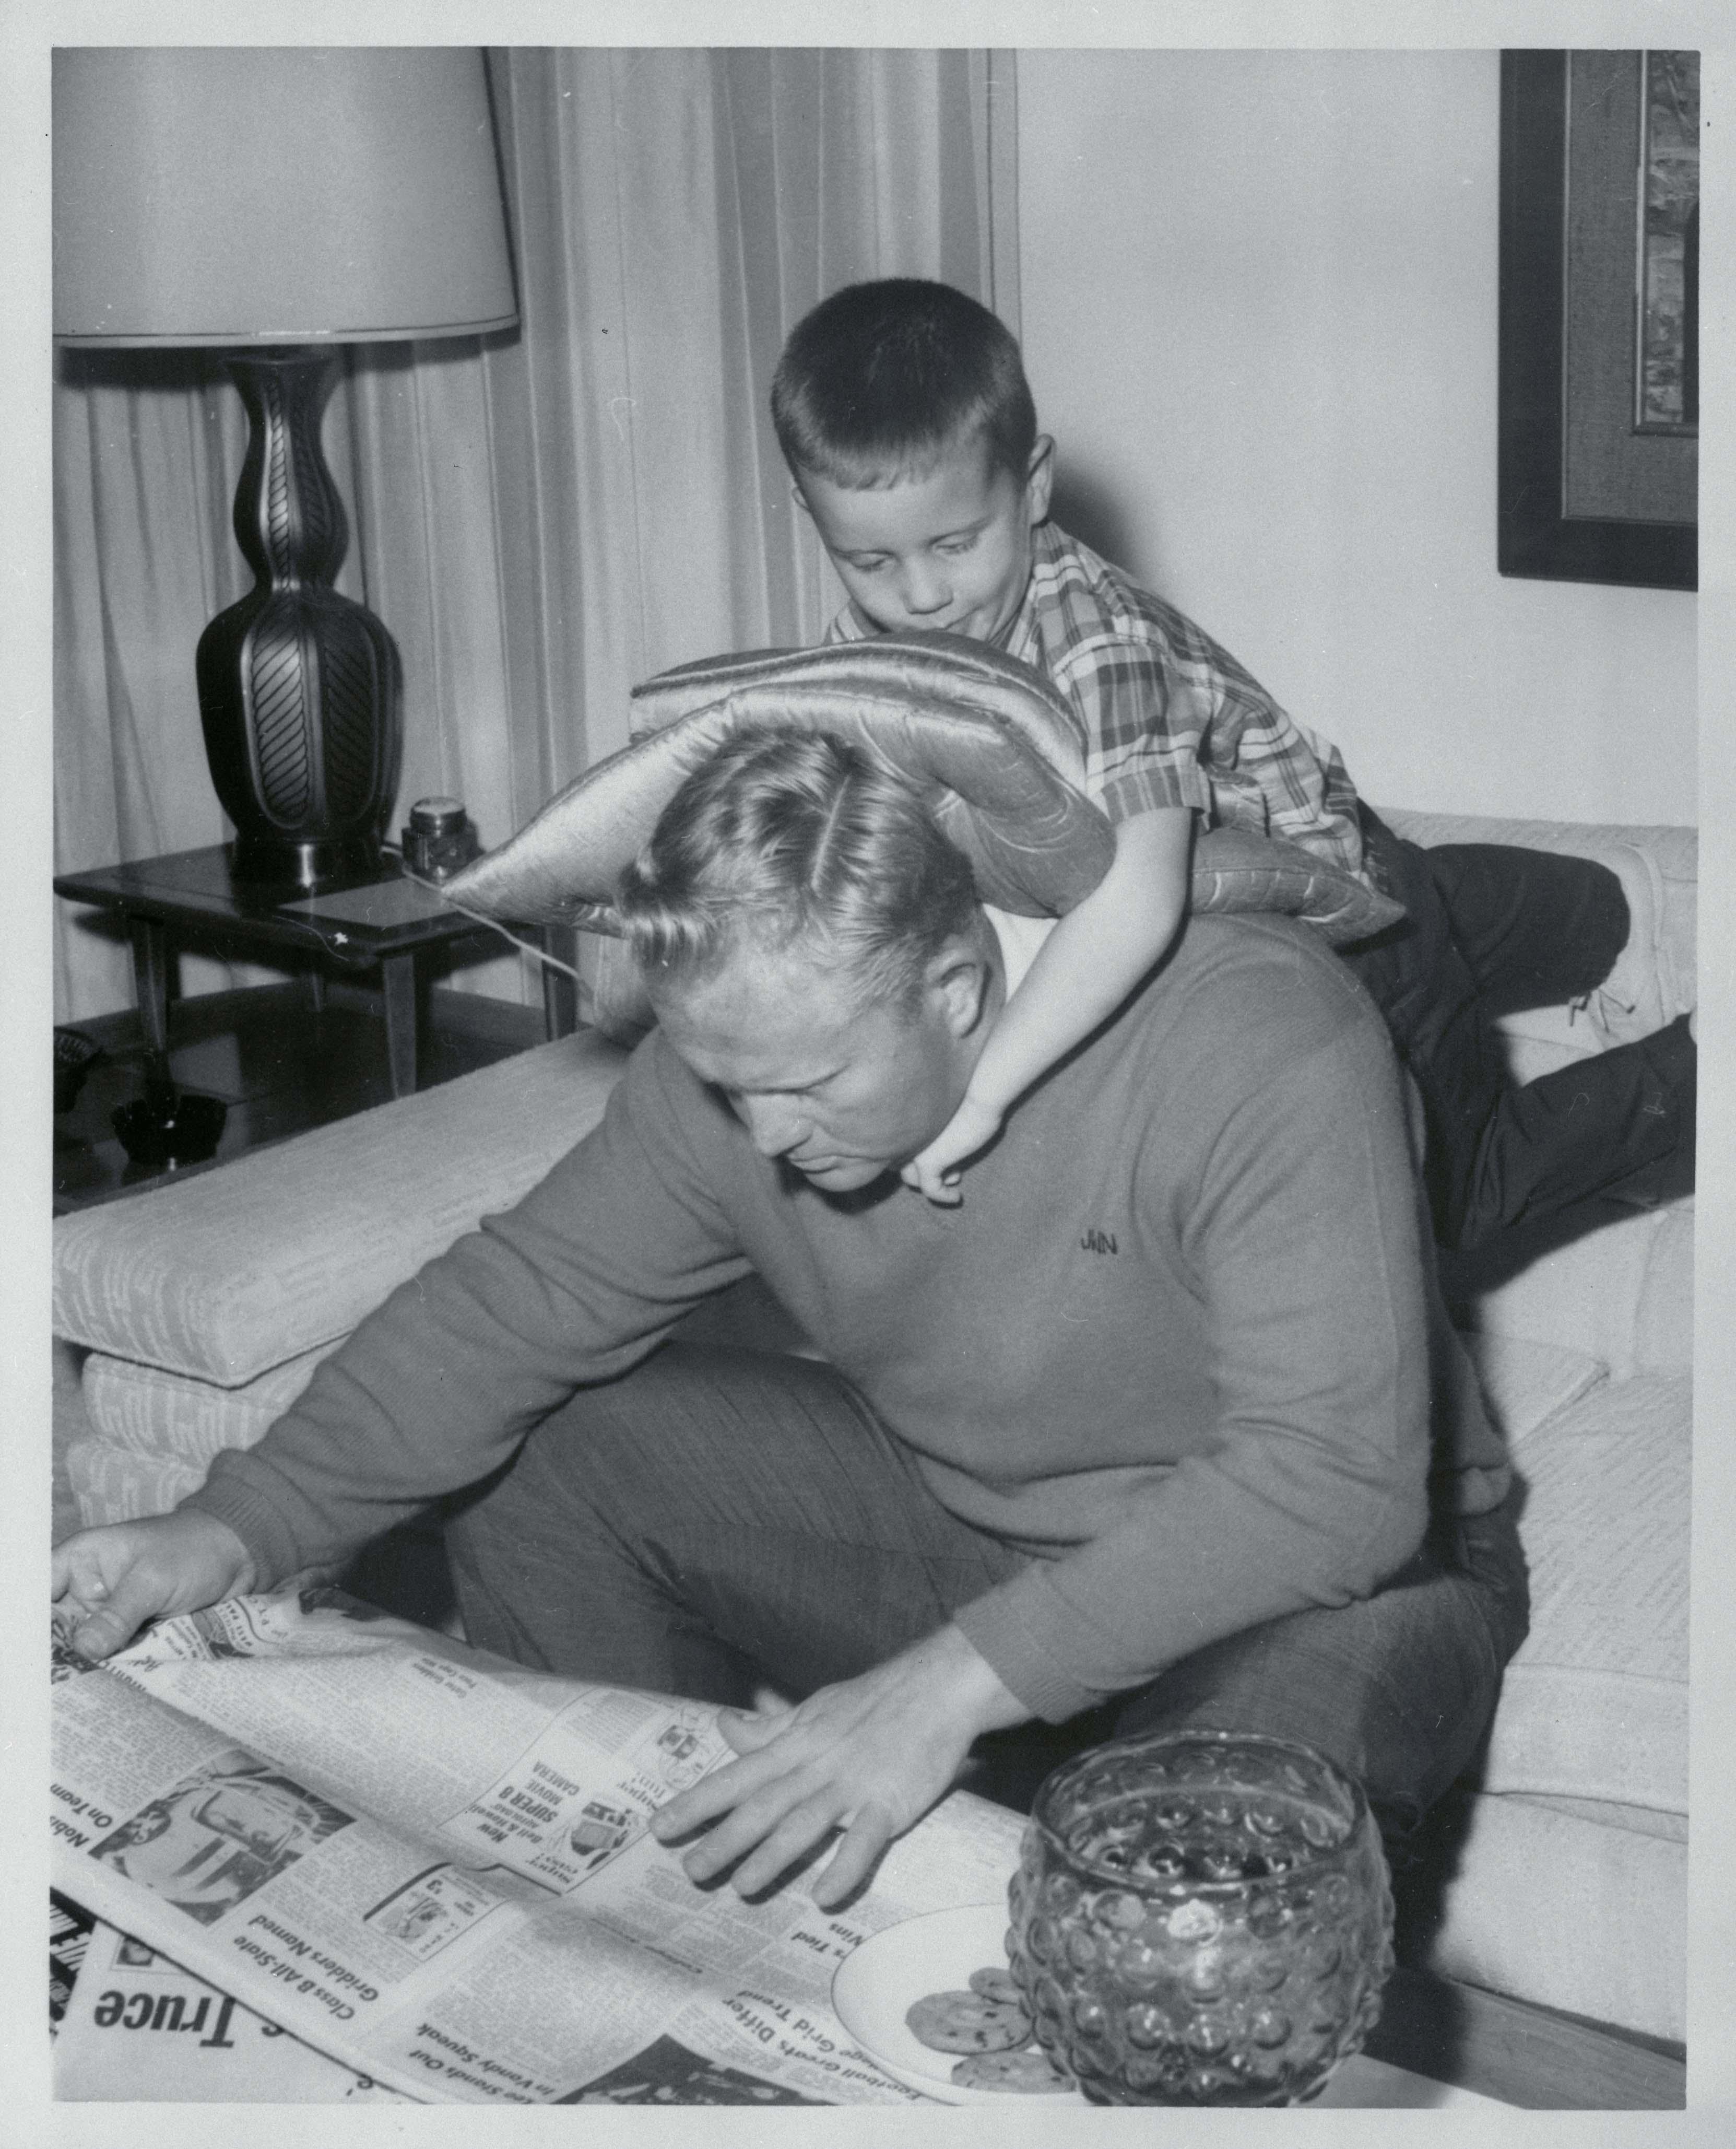 Being a dad, 1966